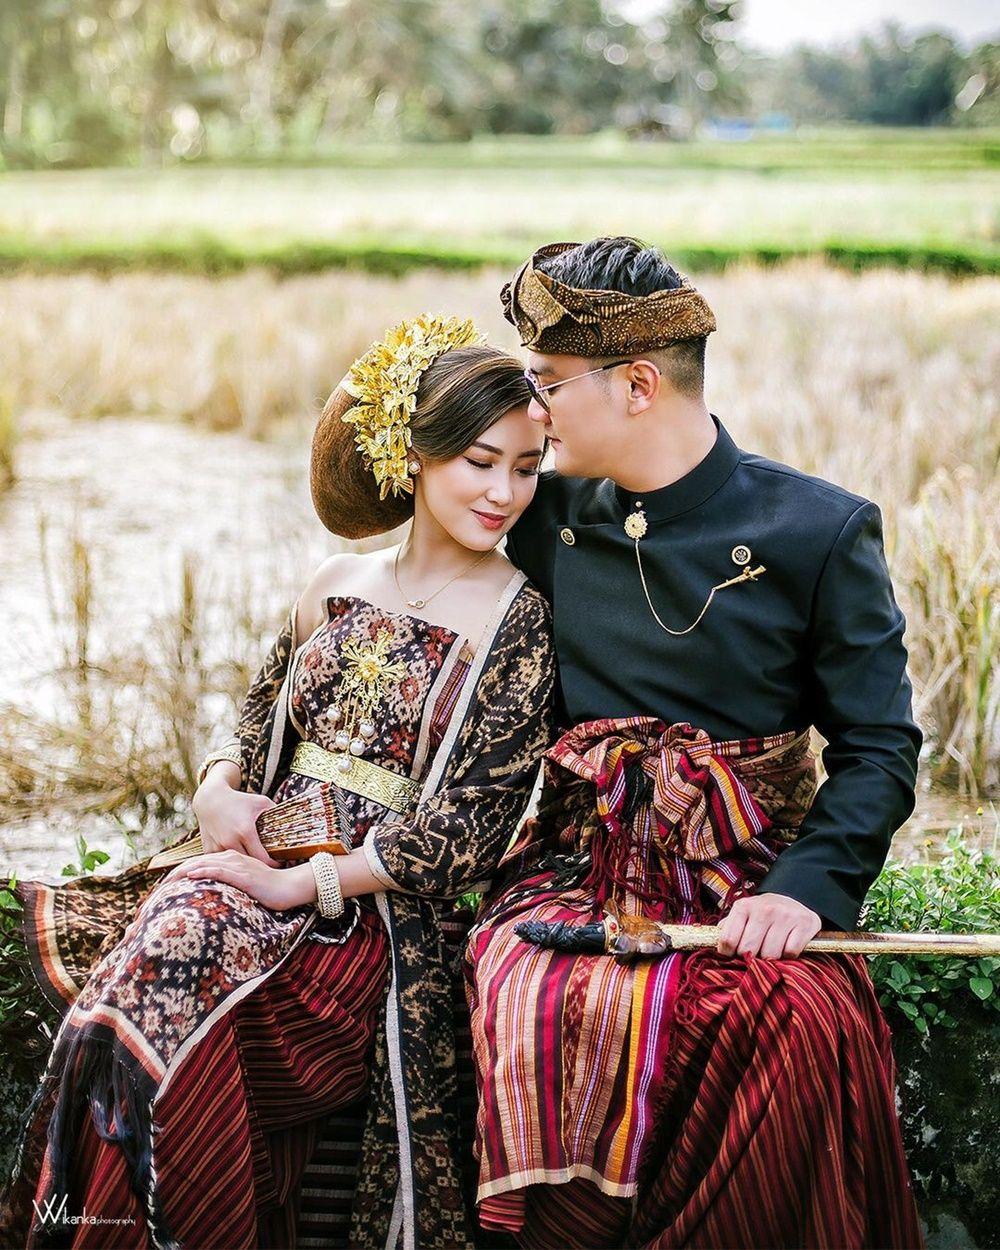 8 Potret Boy William & Karen Vendela dengan Adat Bali, Bak Bangsawan!